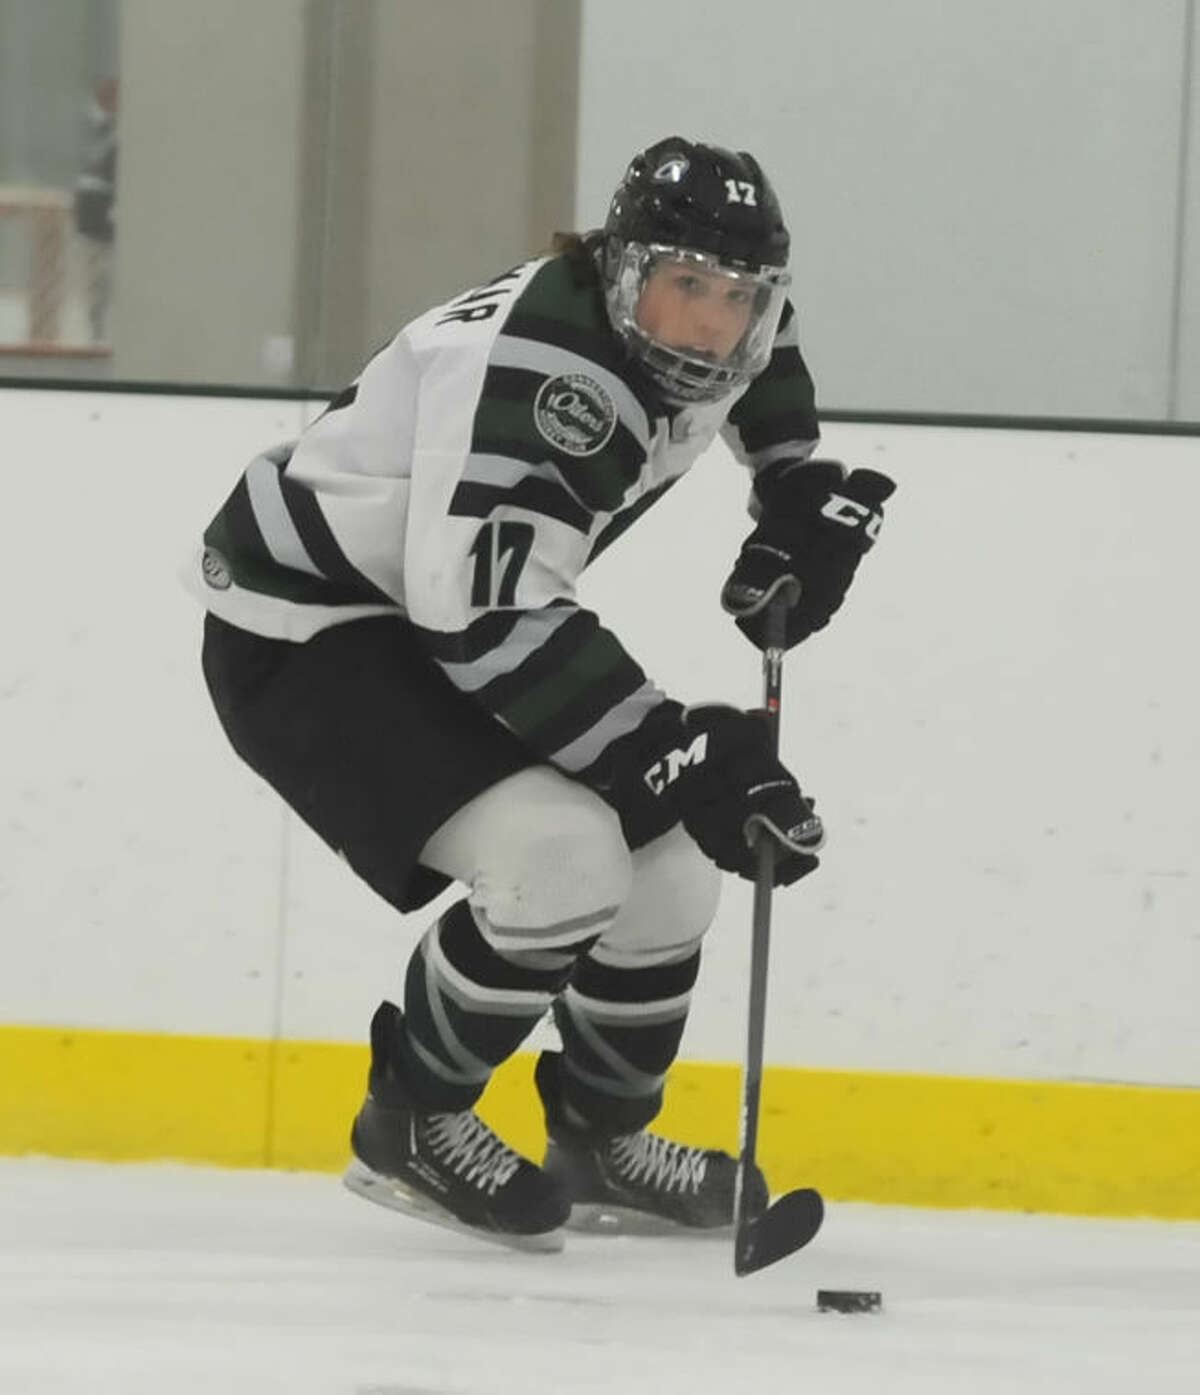 Connecticut Oilers forward Joe Widmar has verbally committed to play hockey at Maine next season.